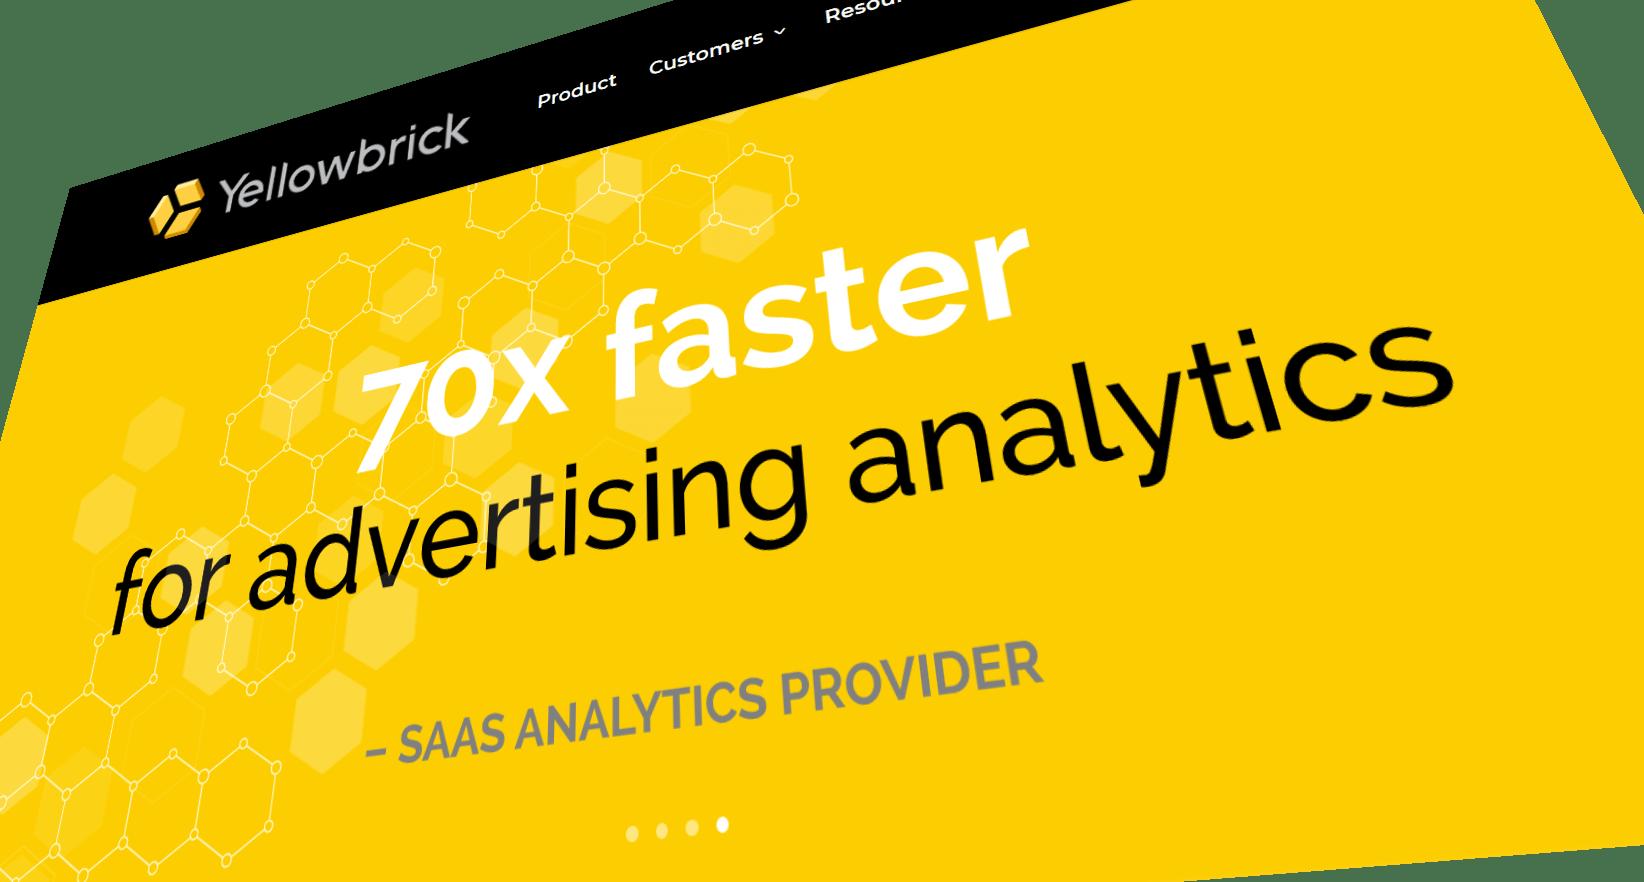 techmeme data warehousing startup yellowbrick data raises